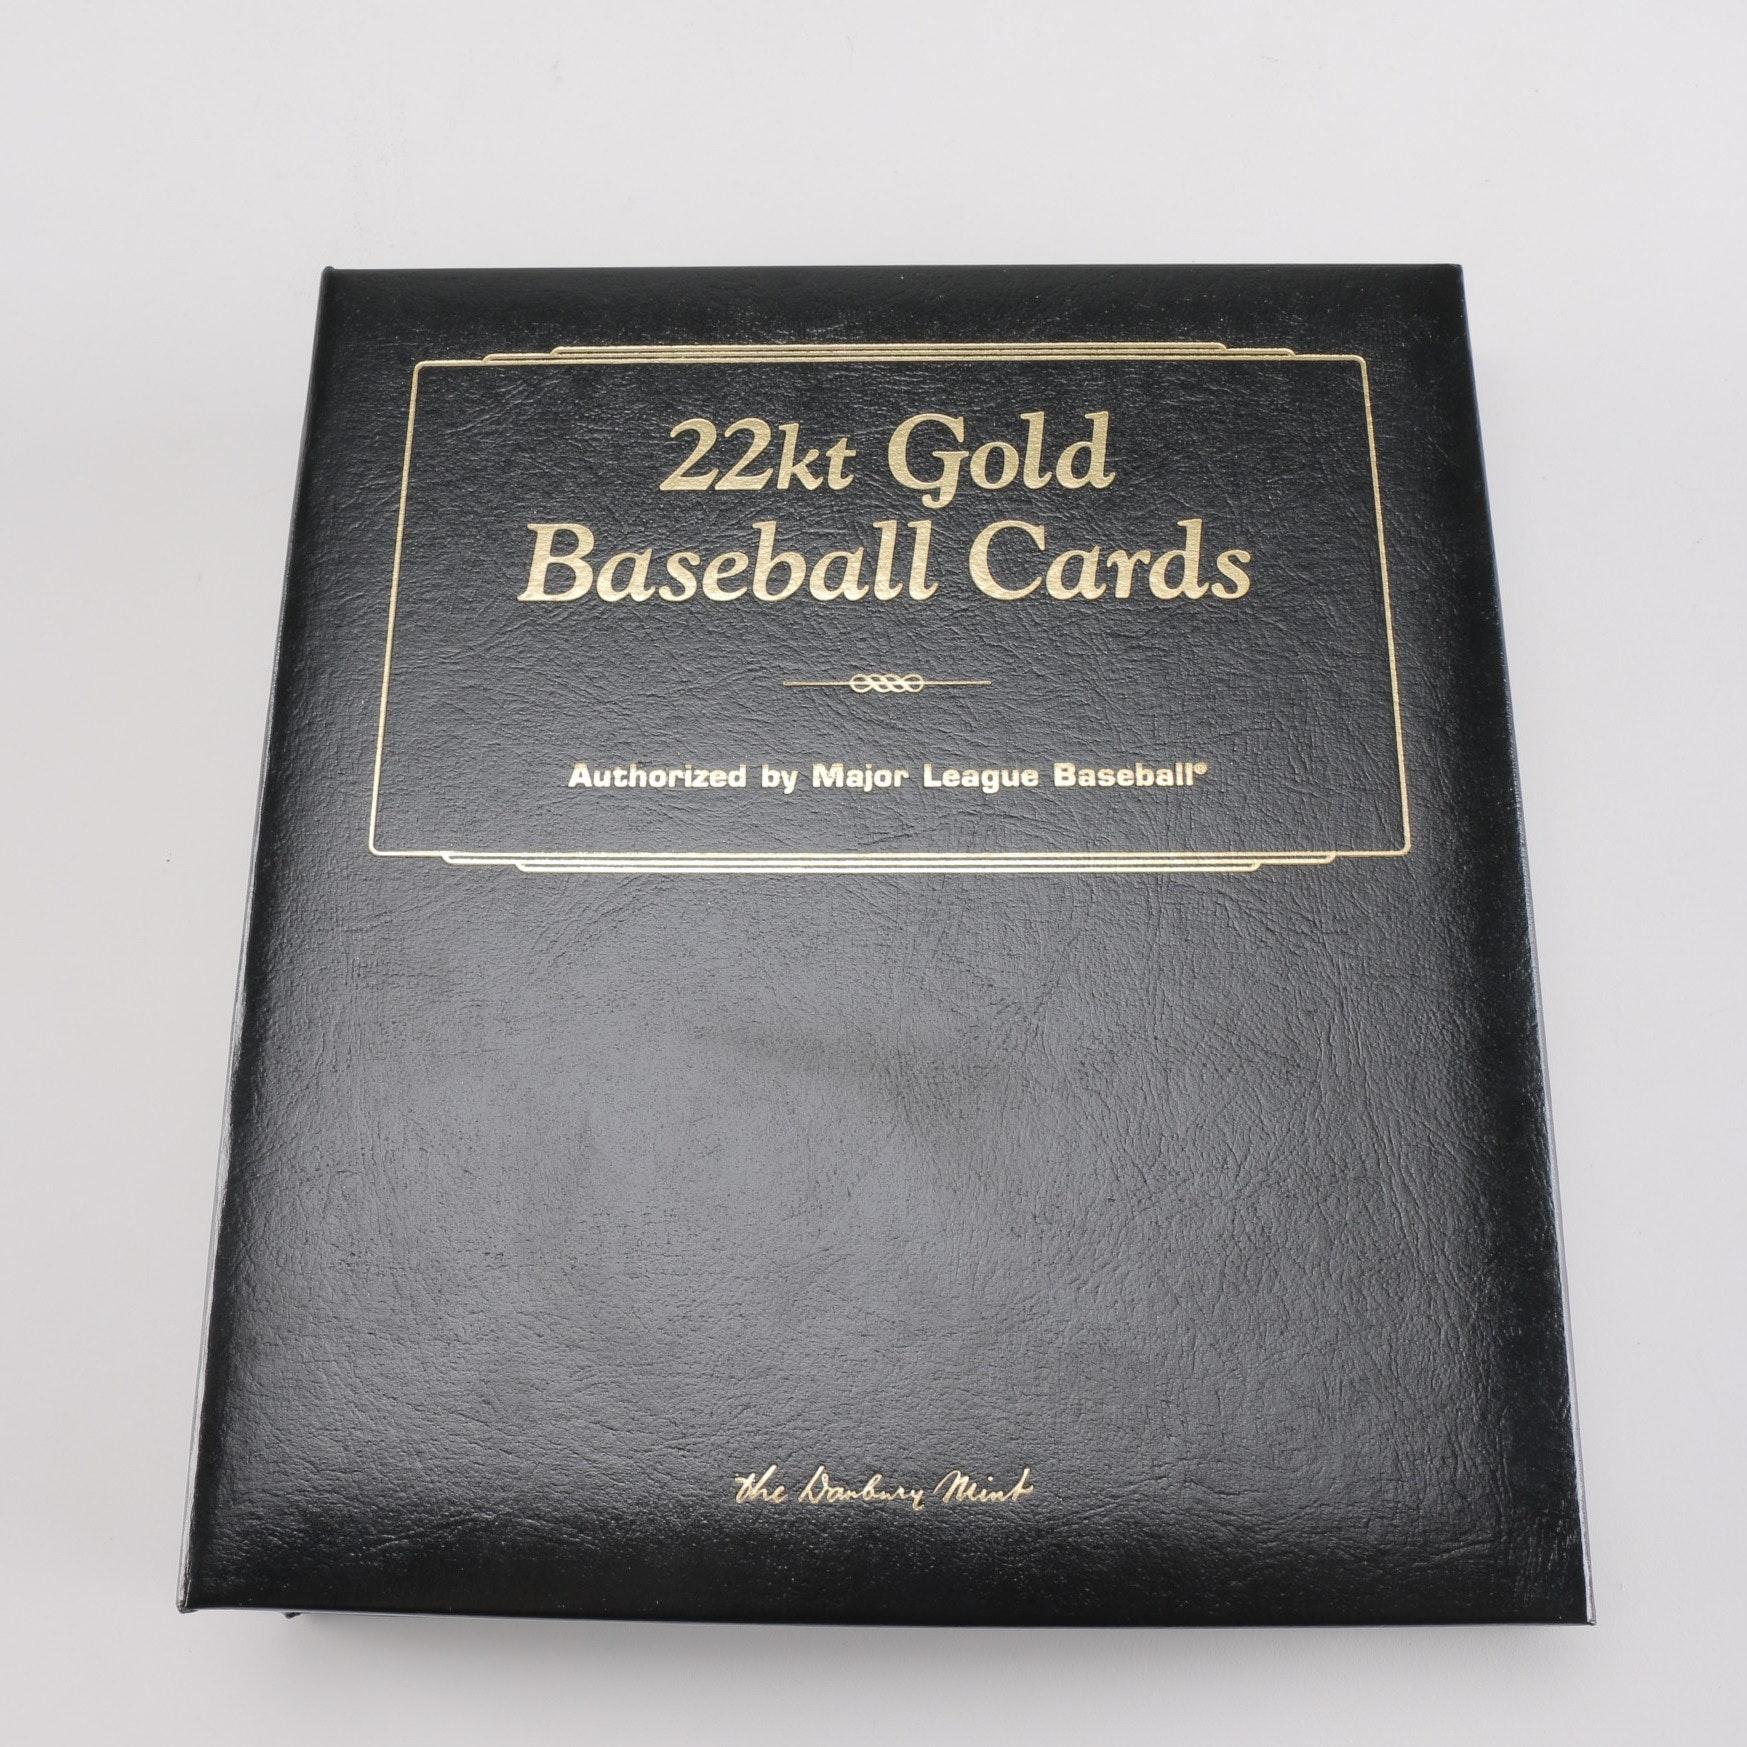 22kt Gold Baseball Cards